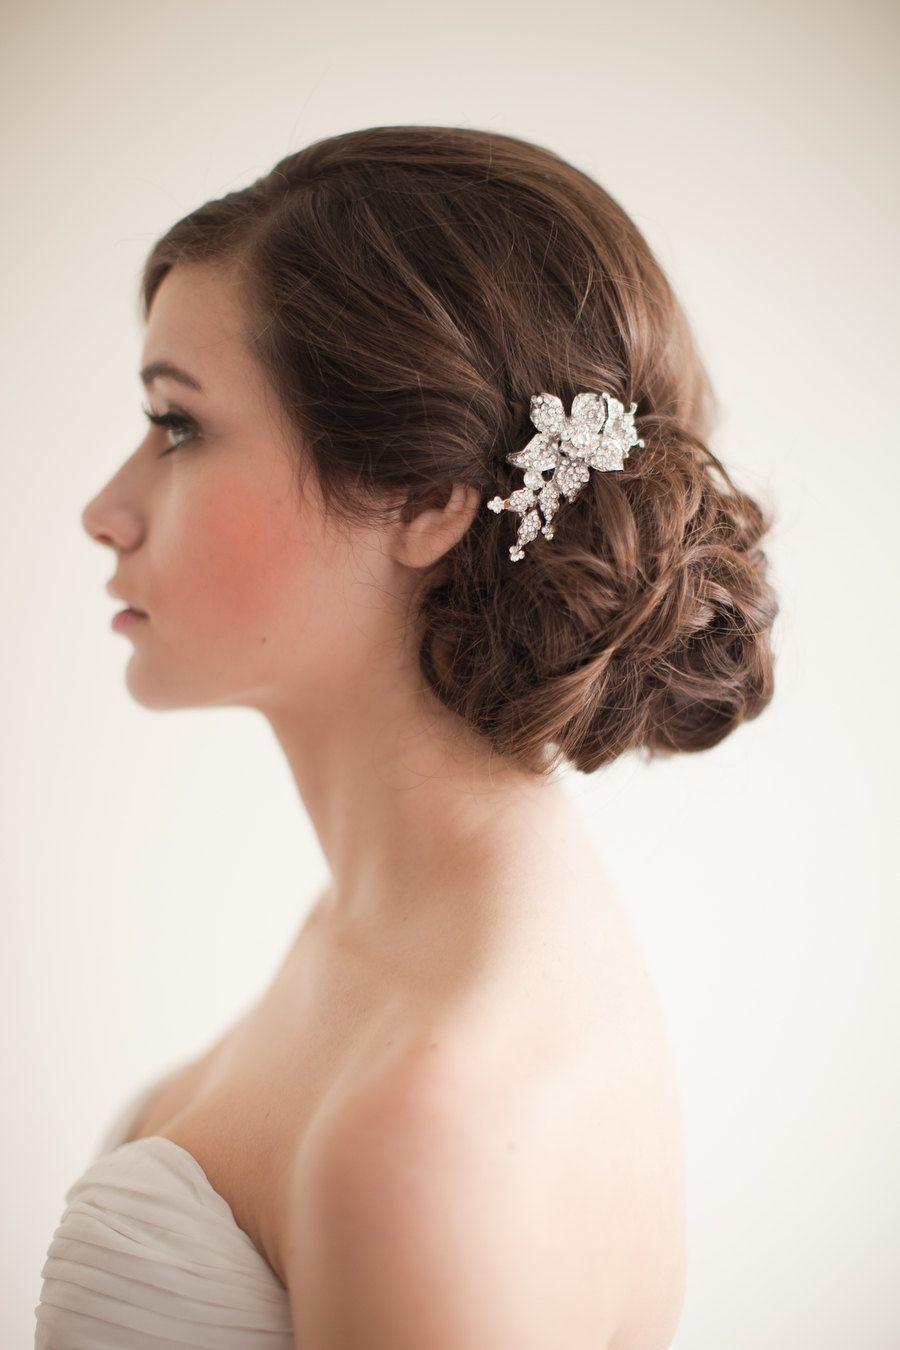 wedding hair combs Flower Rhinestone Bridal Comb Floral Rhinestone Comb Jeweled Bridal Comb Marie MADE TO ORDER